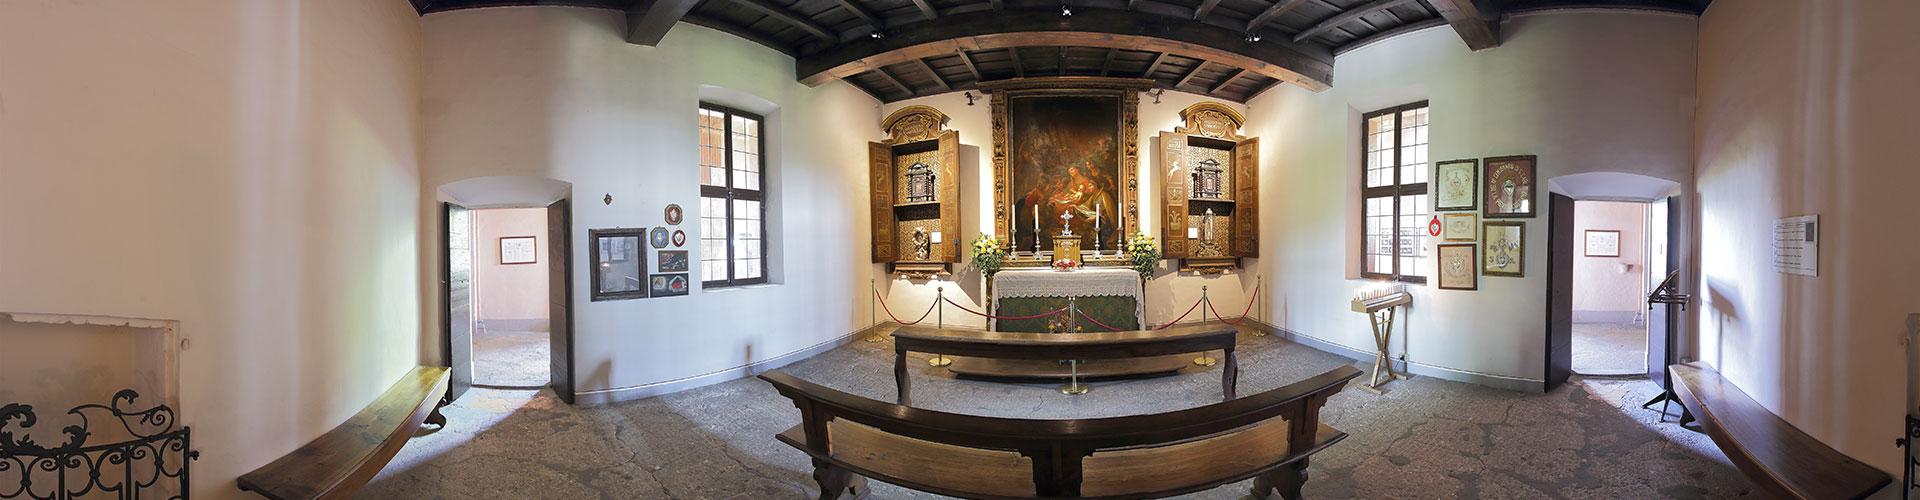 Sacrestia e reliquie di San Carlo Borromeo